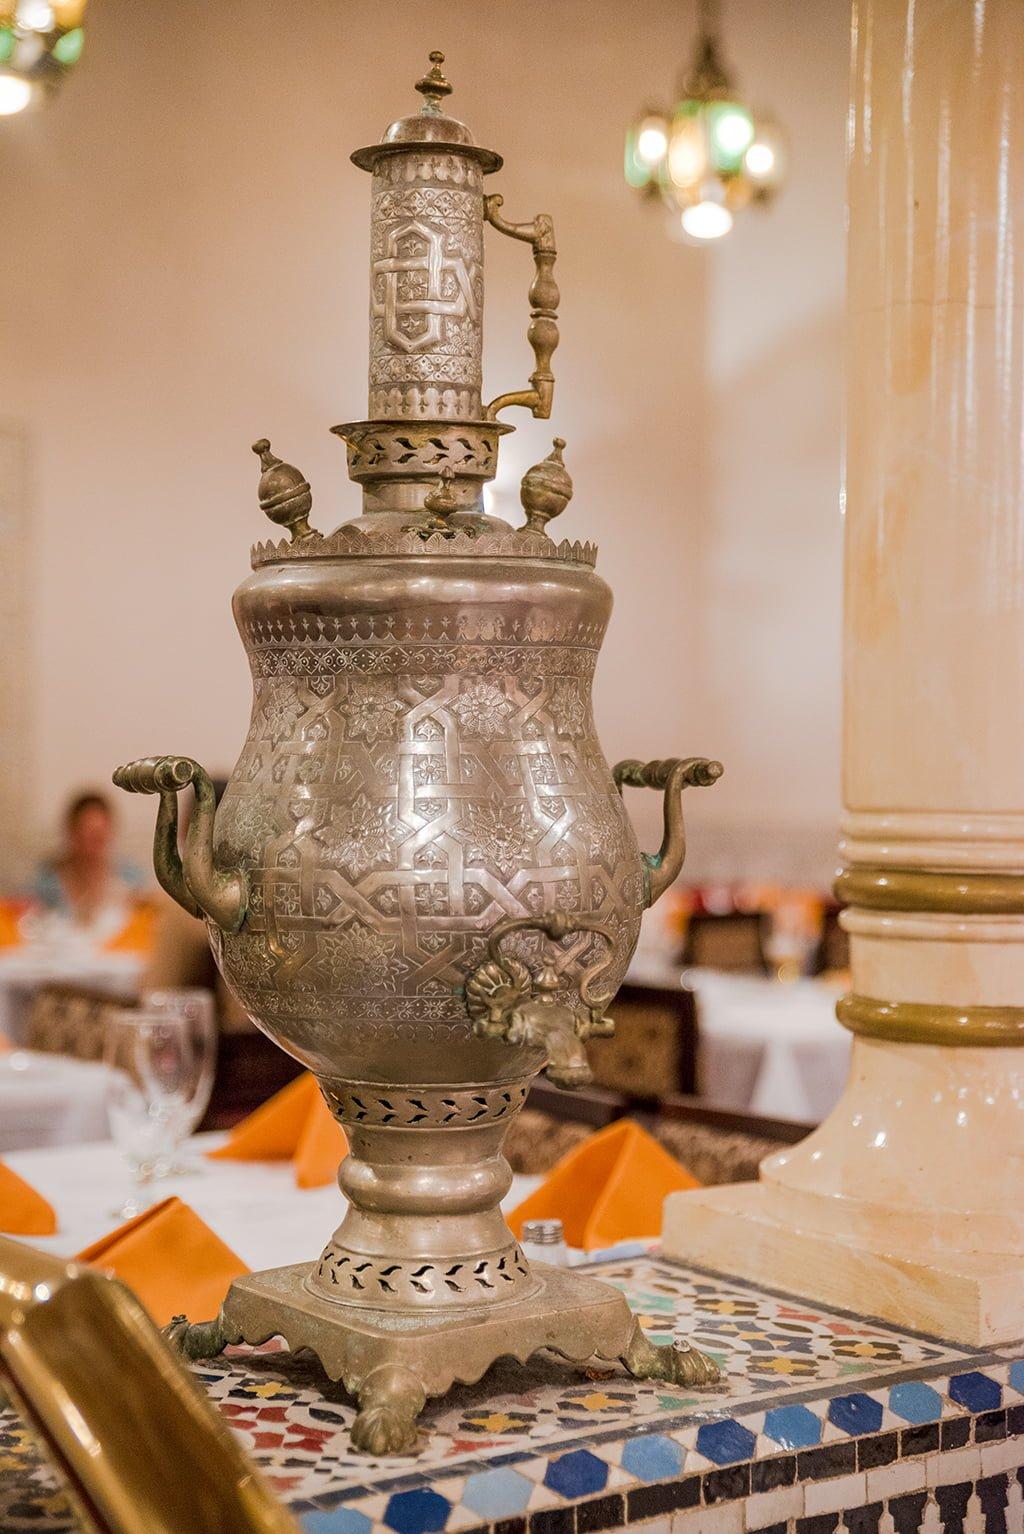 Just Like Home Toy Restaurant Menu : Restaurant marrakesh review disney tourist